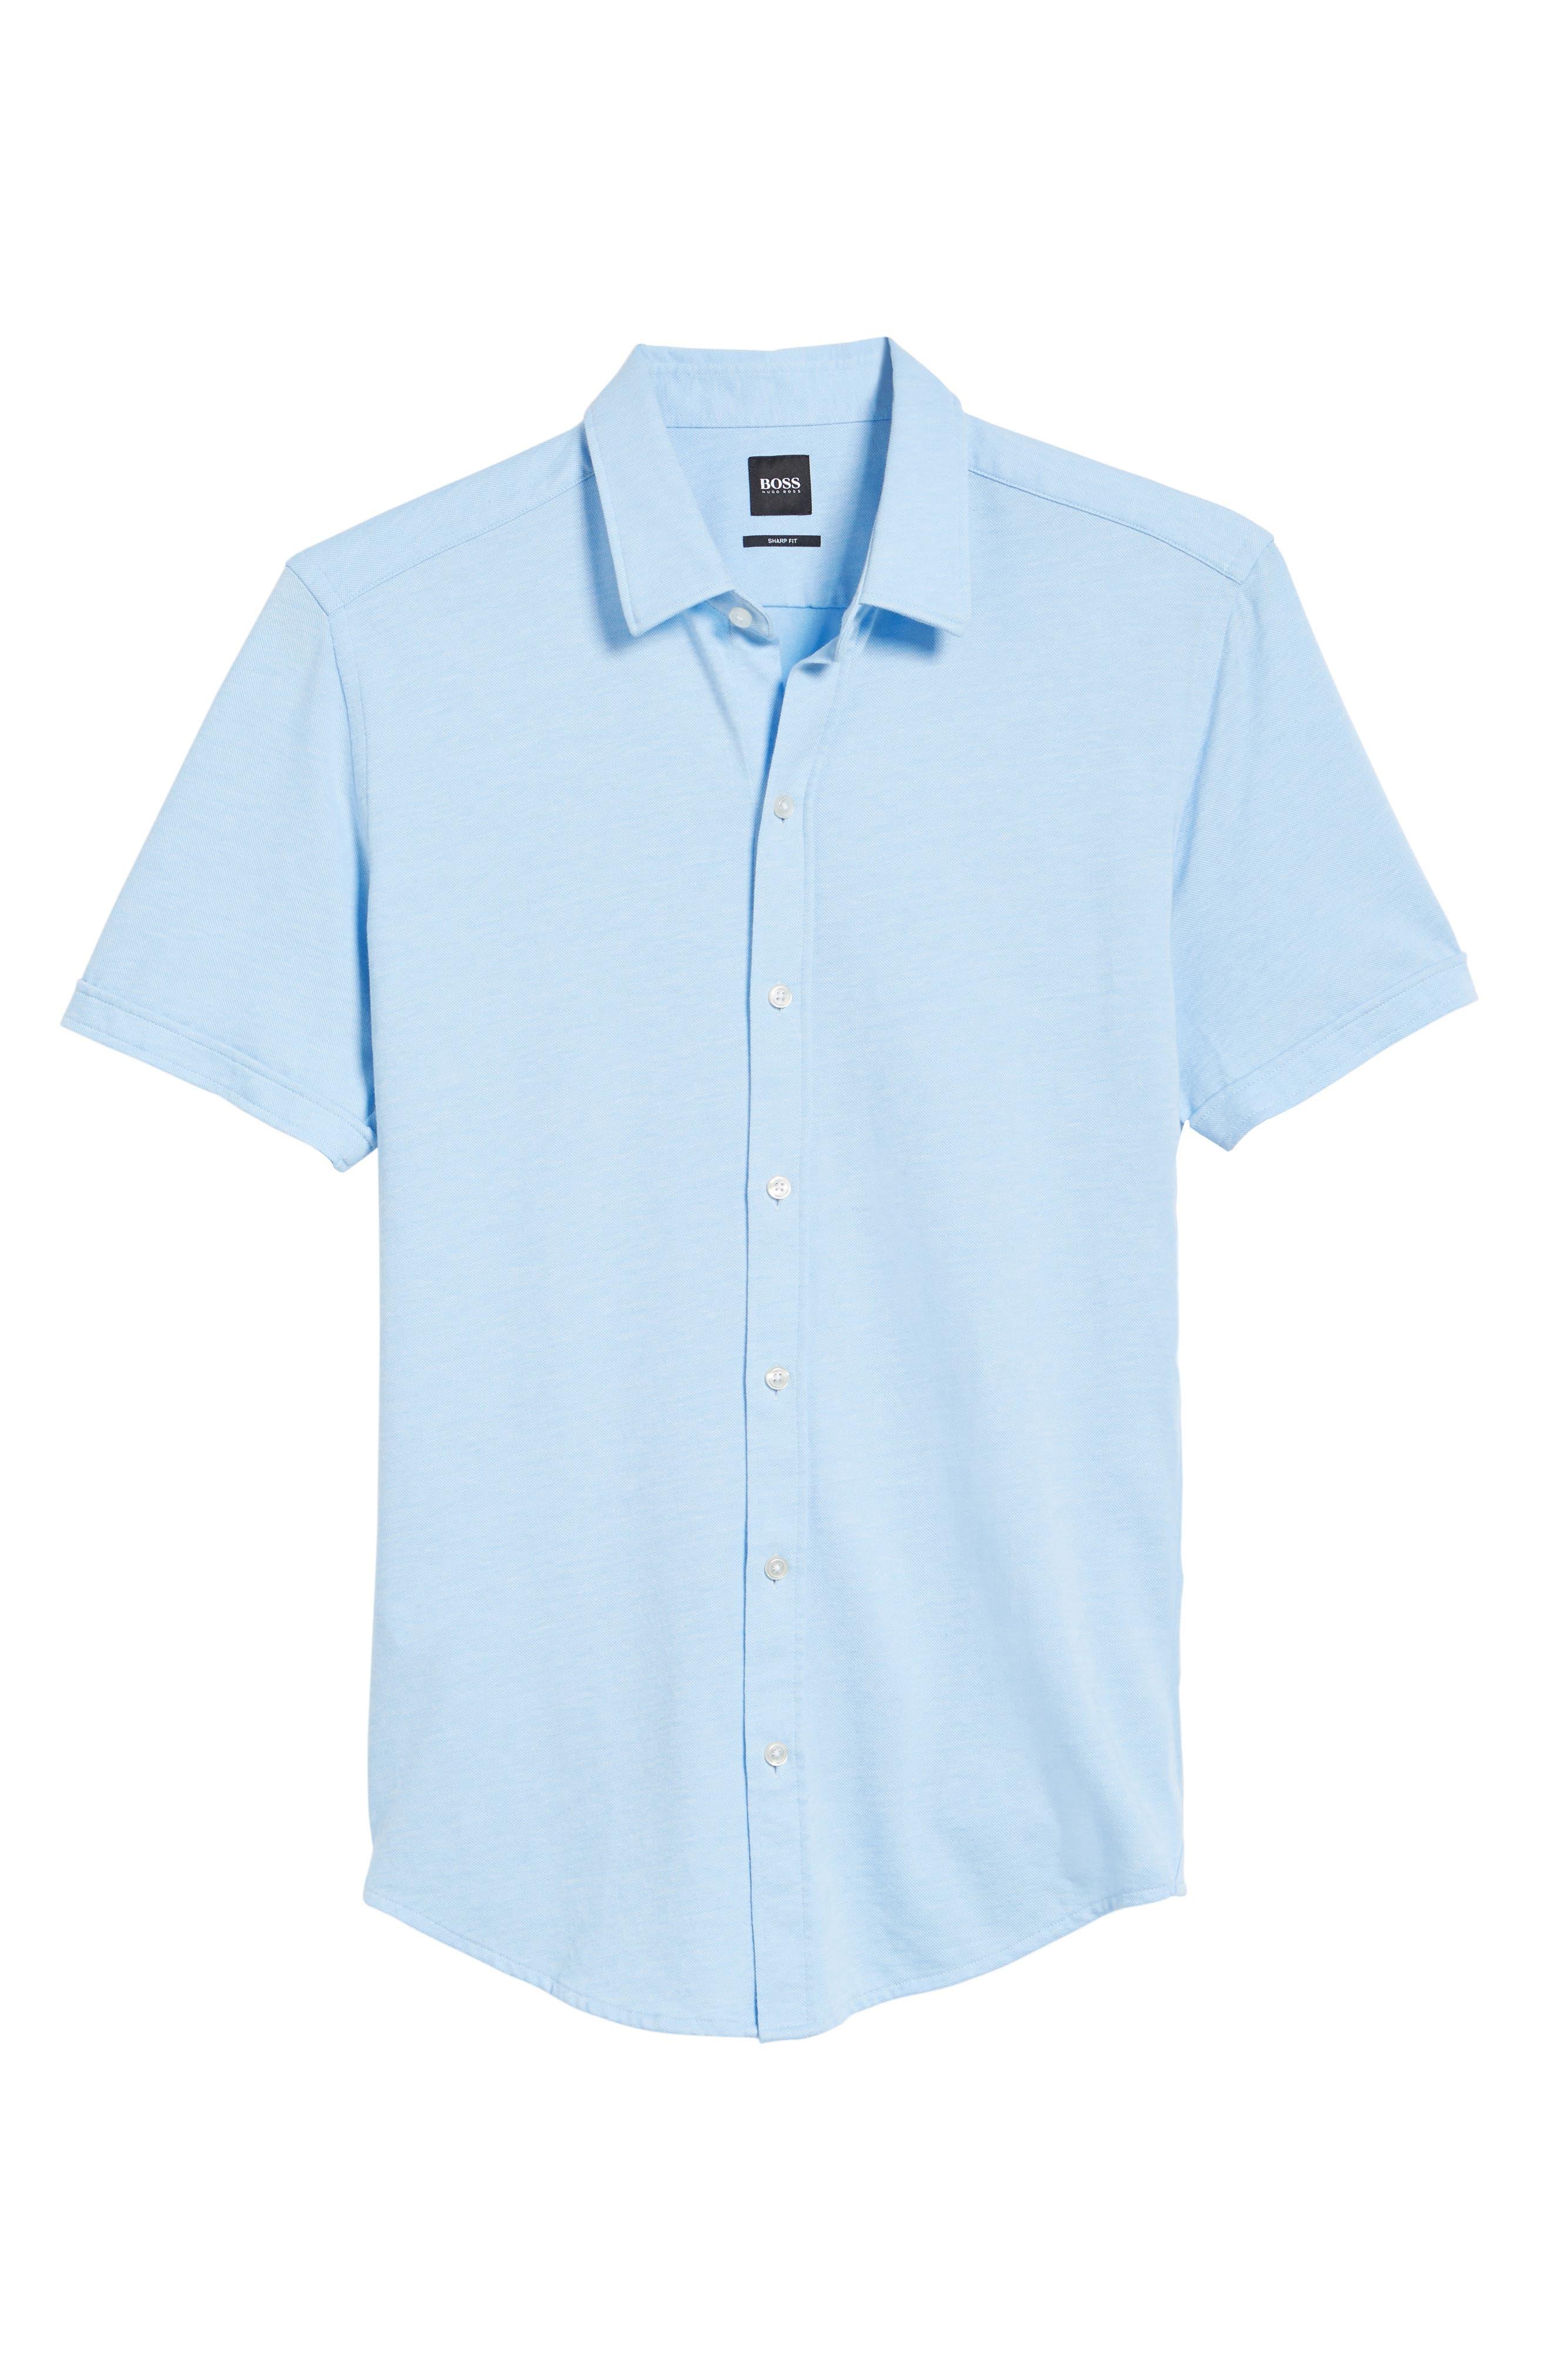 Robb Slim Fit Short Sleeve Sport Shirt,                             Alternate thumbnail 6, color,                             Light Blue